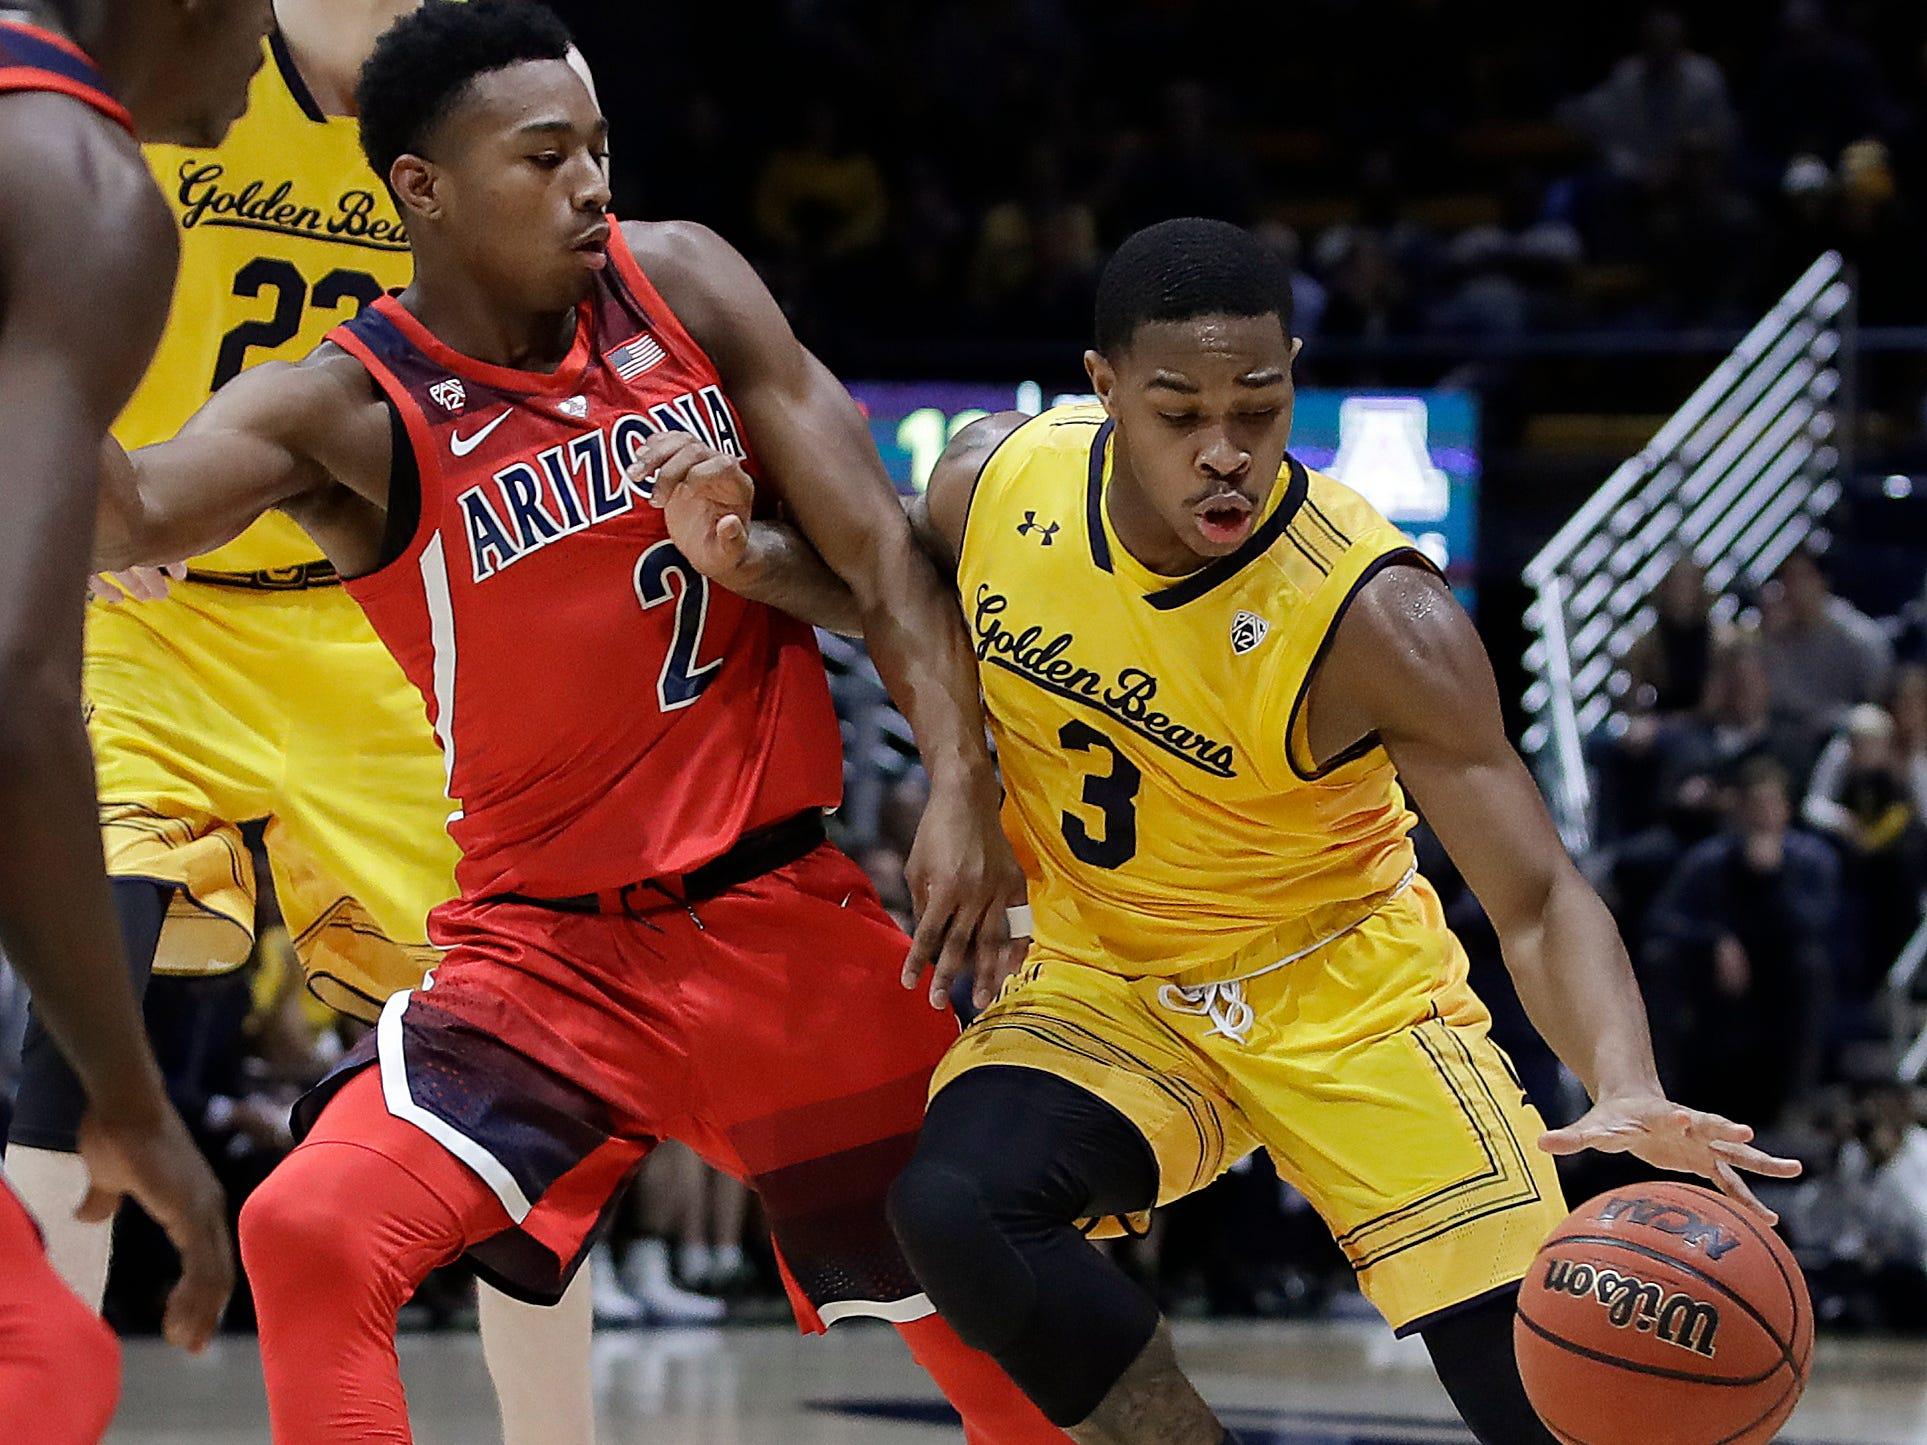 California's Paris Austin, right, drives the ball against Arizona's Brandon Williams (2) during the first half of an NCAA college basketball game Saturday, Jan. 12, 2019, in Berkeley, Calif. (AP Photo/Ben Margot)